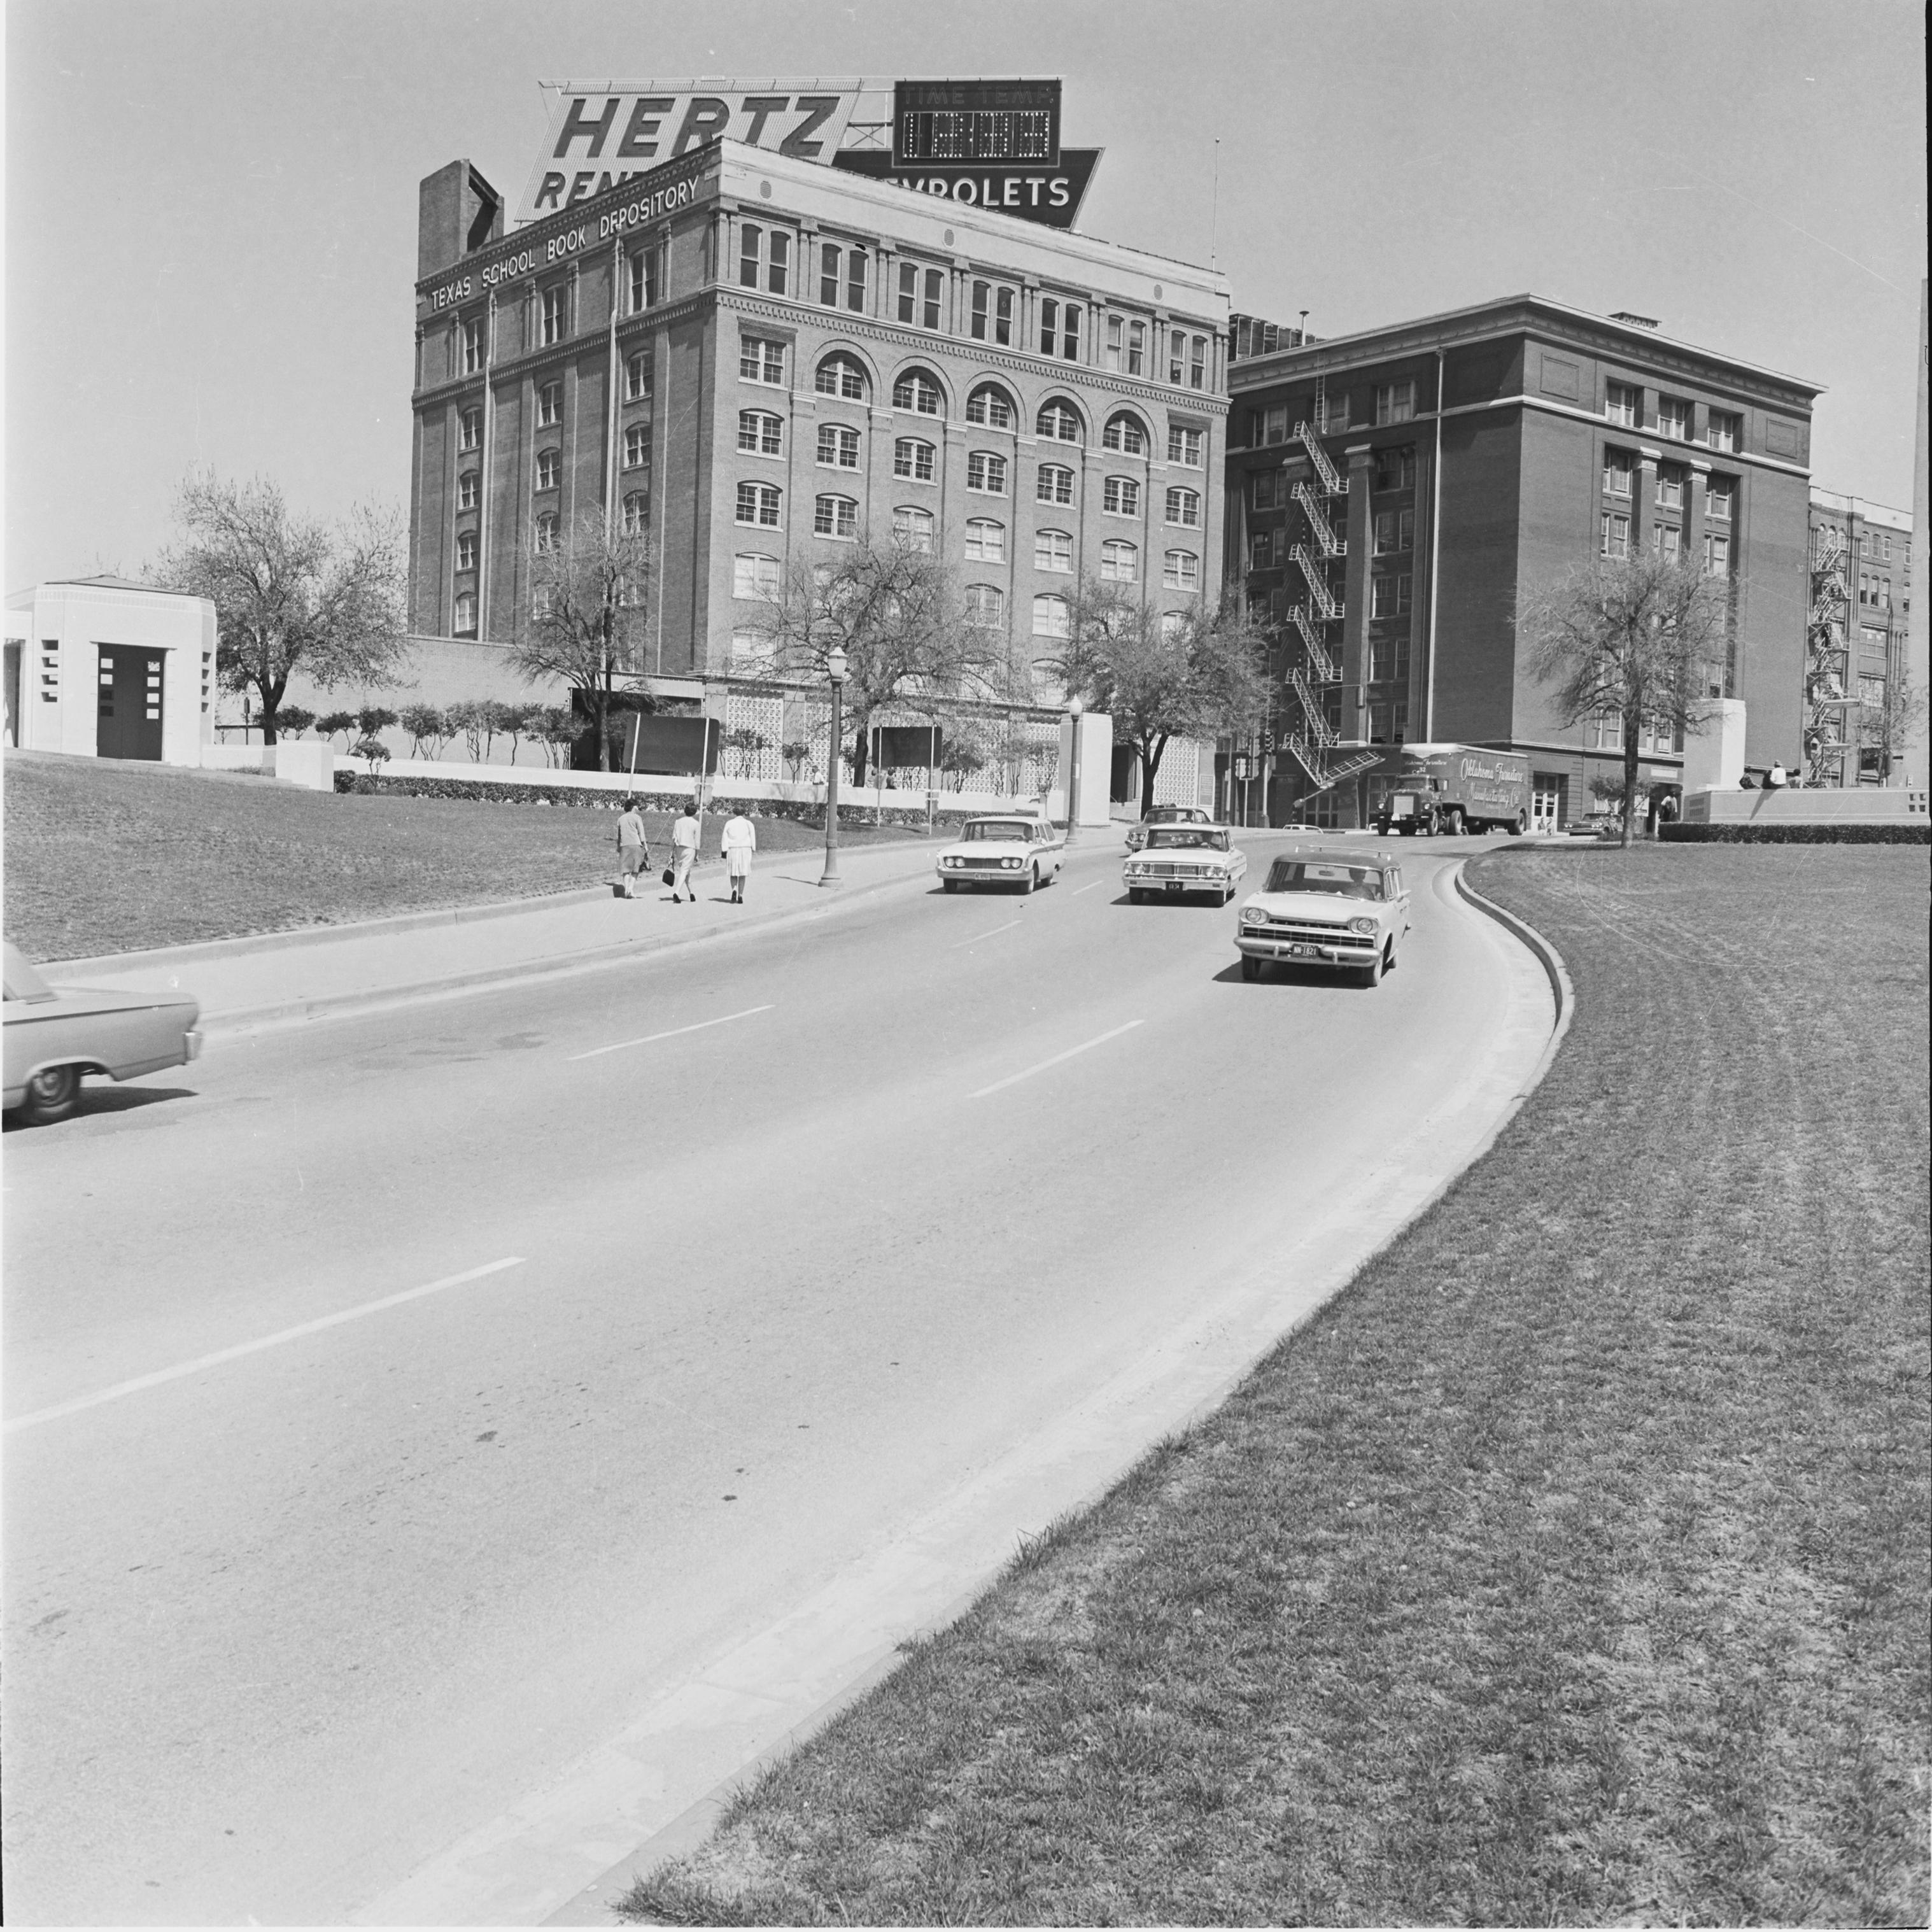 Kennedy Floor Covering Carpet Gallery: Elm St. Where JFK Was Assassinated, 1963